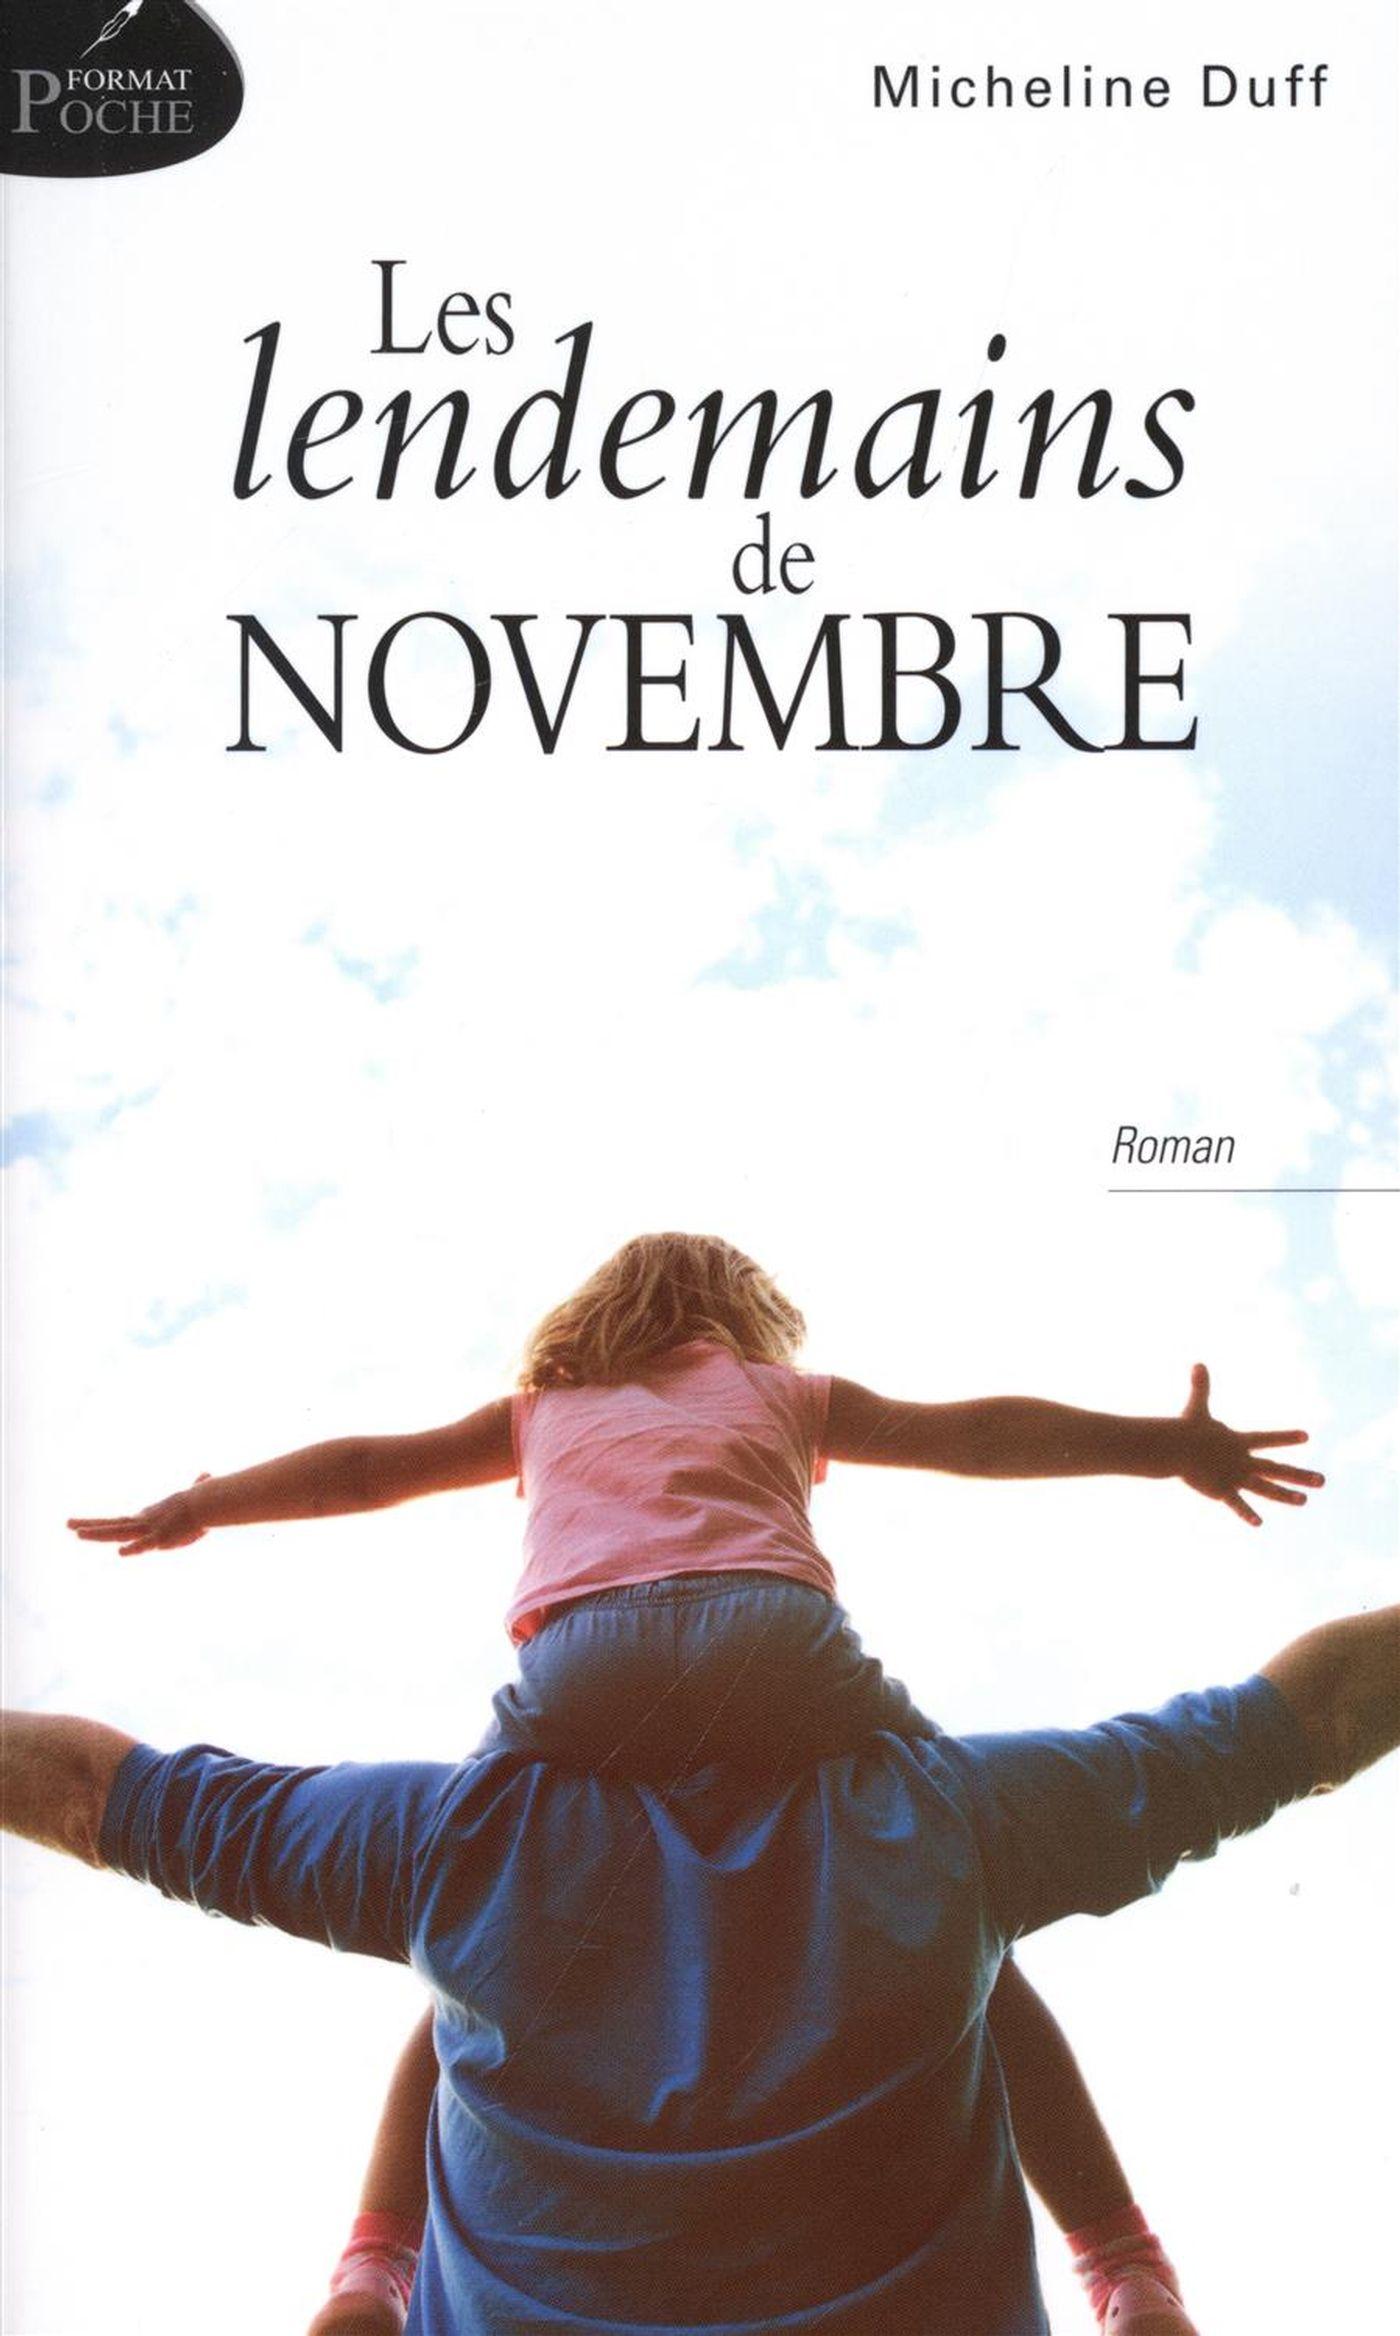 Les lendemains de novembre